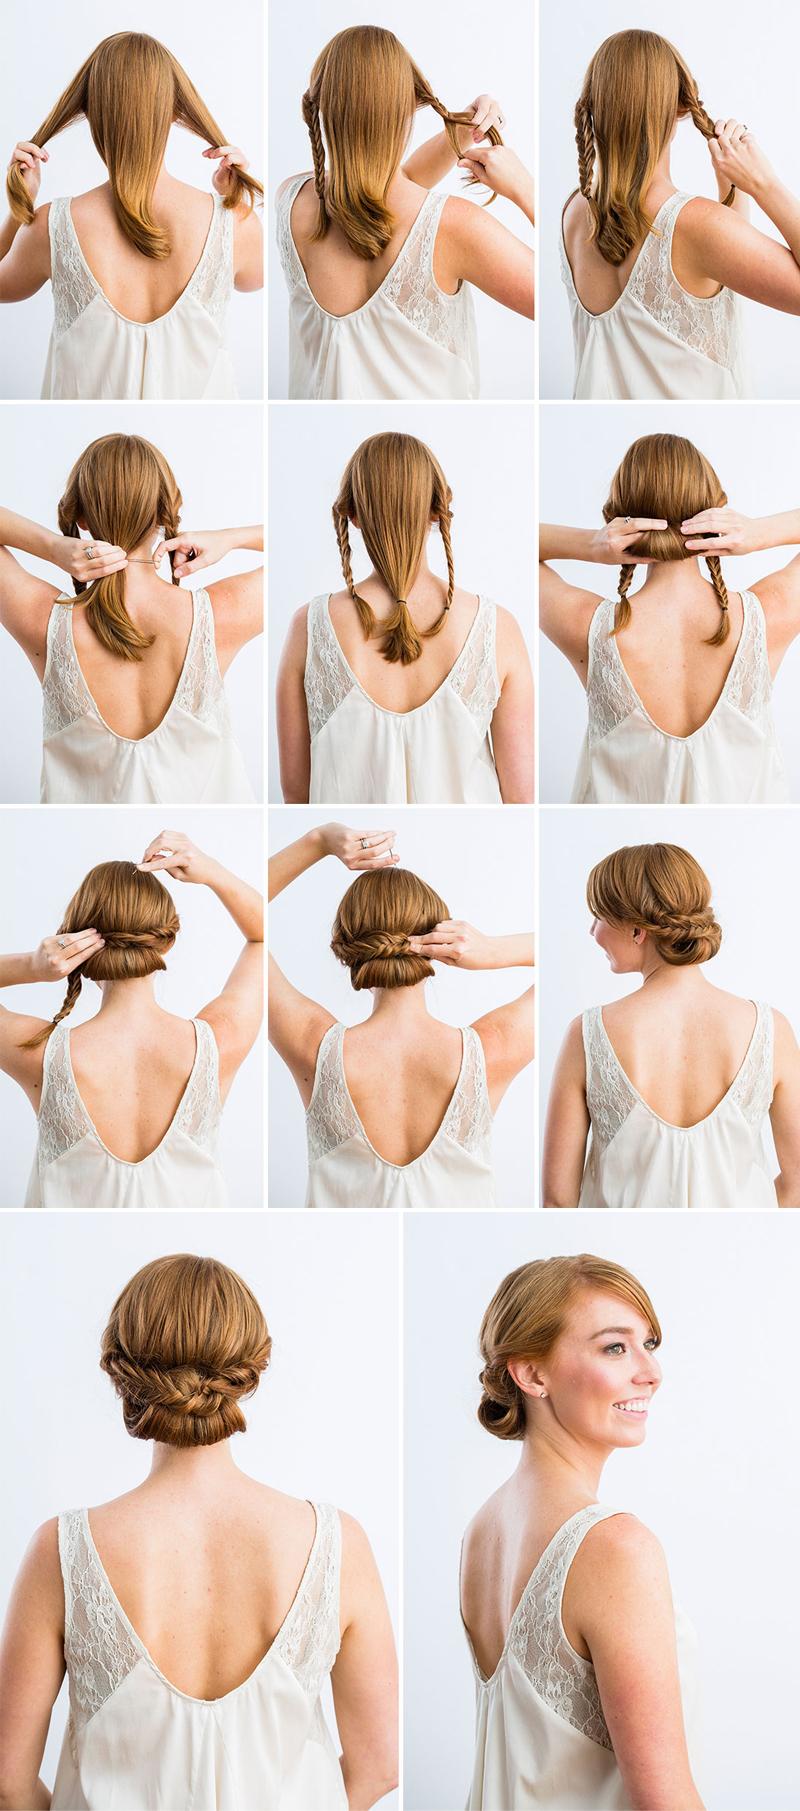 10 Best DIY Wedding Hairstyles with Tutorials  Tulle  Chantilly Wedding Blog